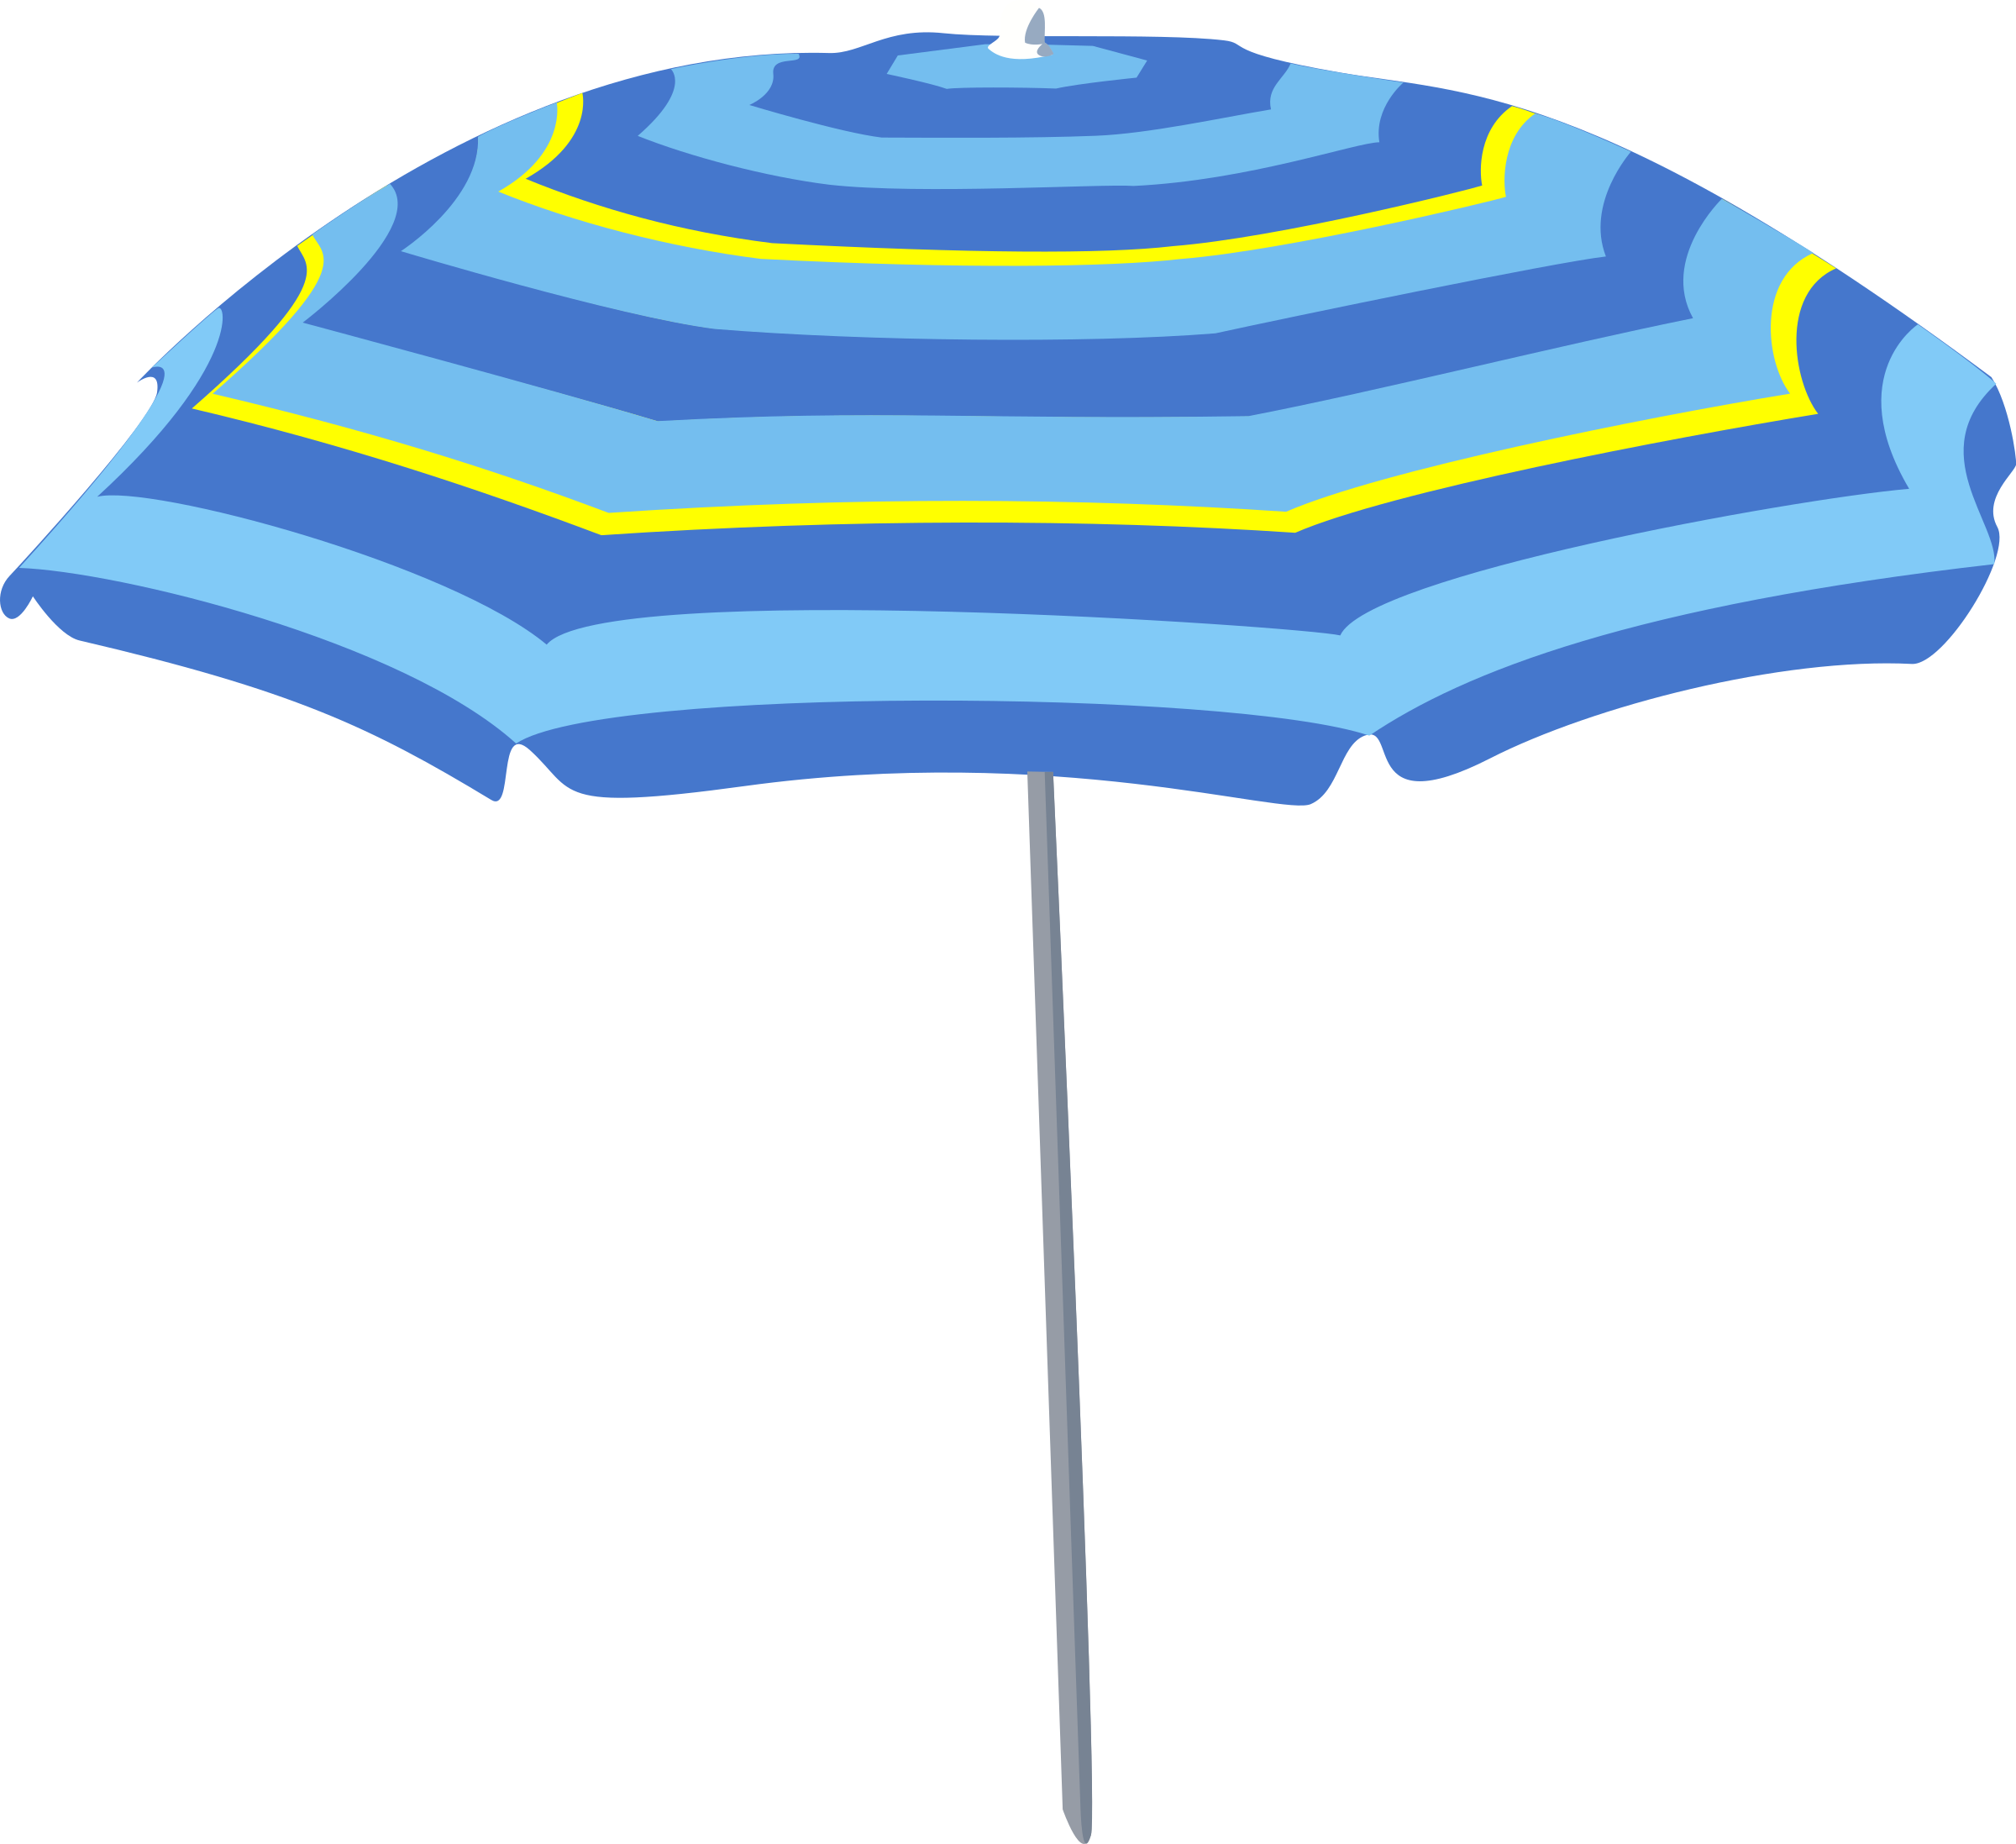 Umbrella clipart large Art Umbrella Clipart – Large